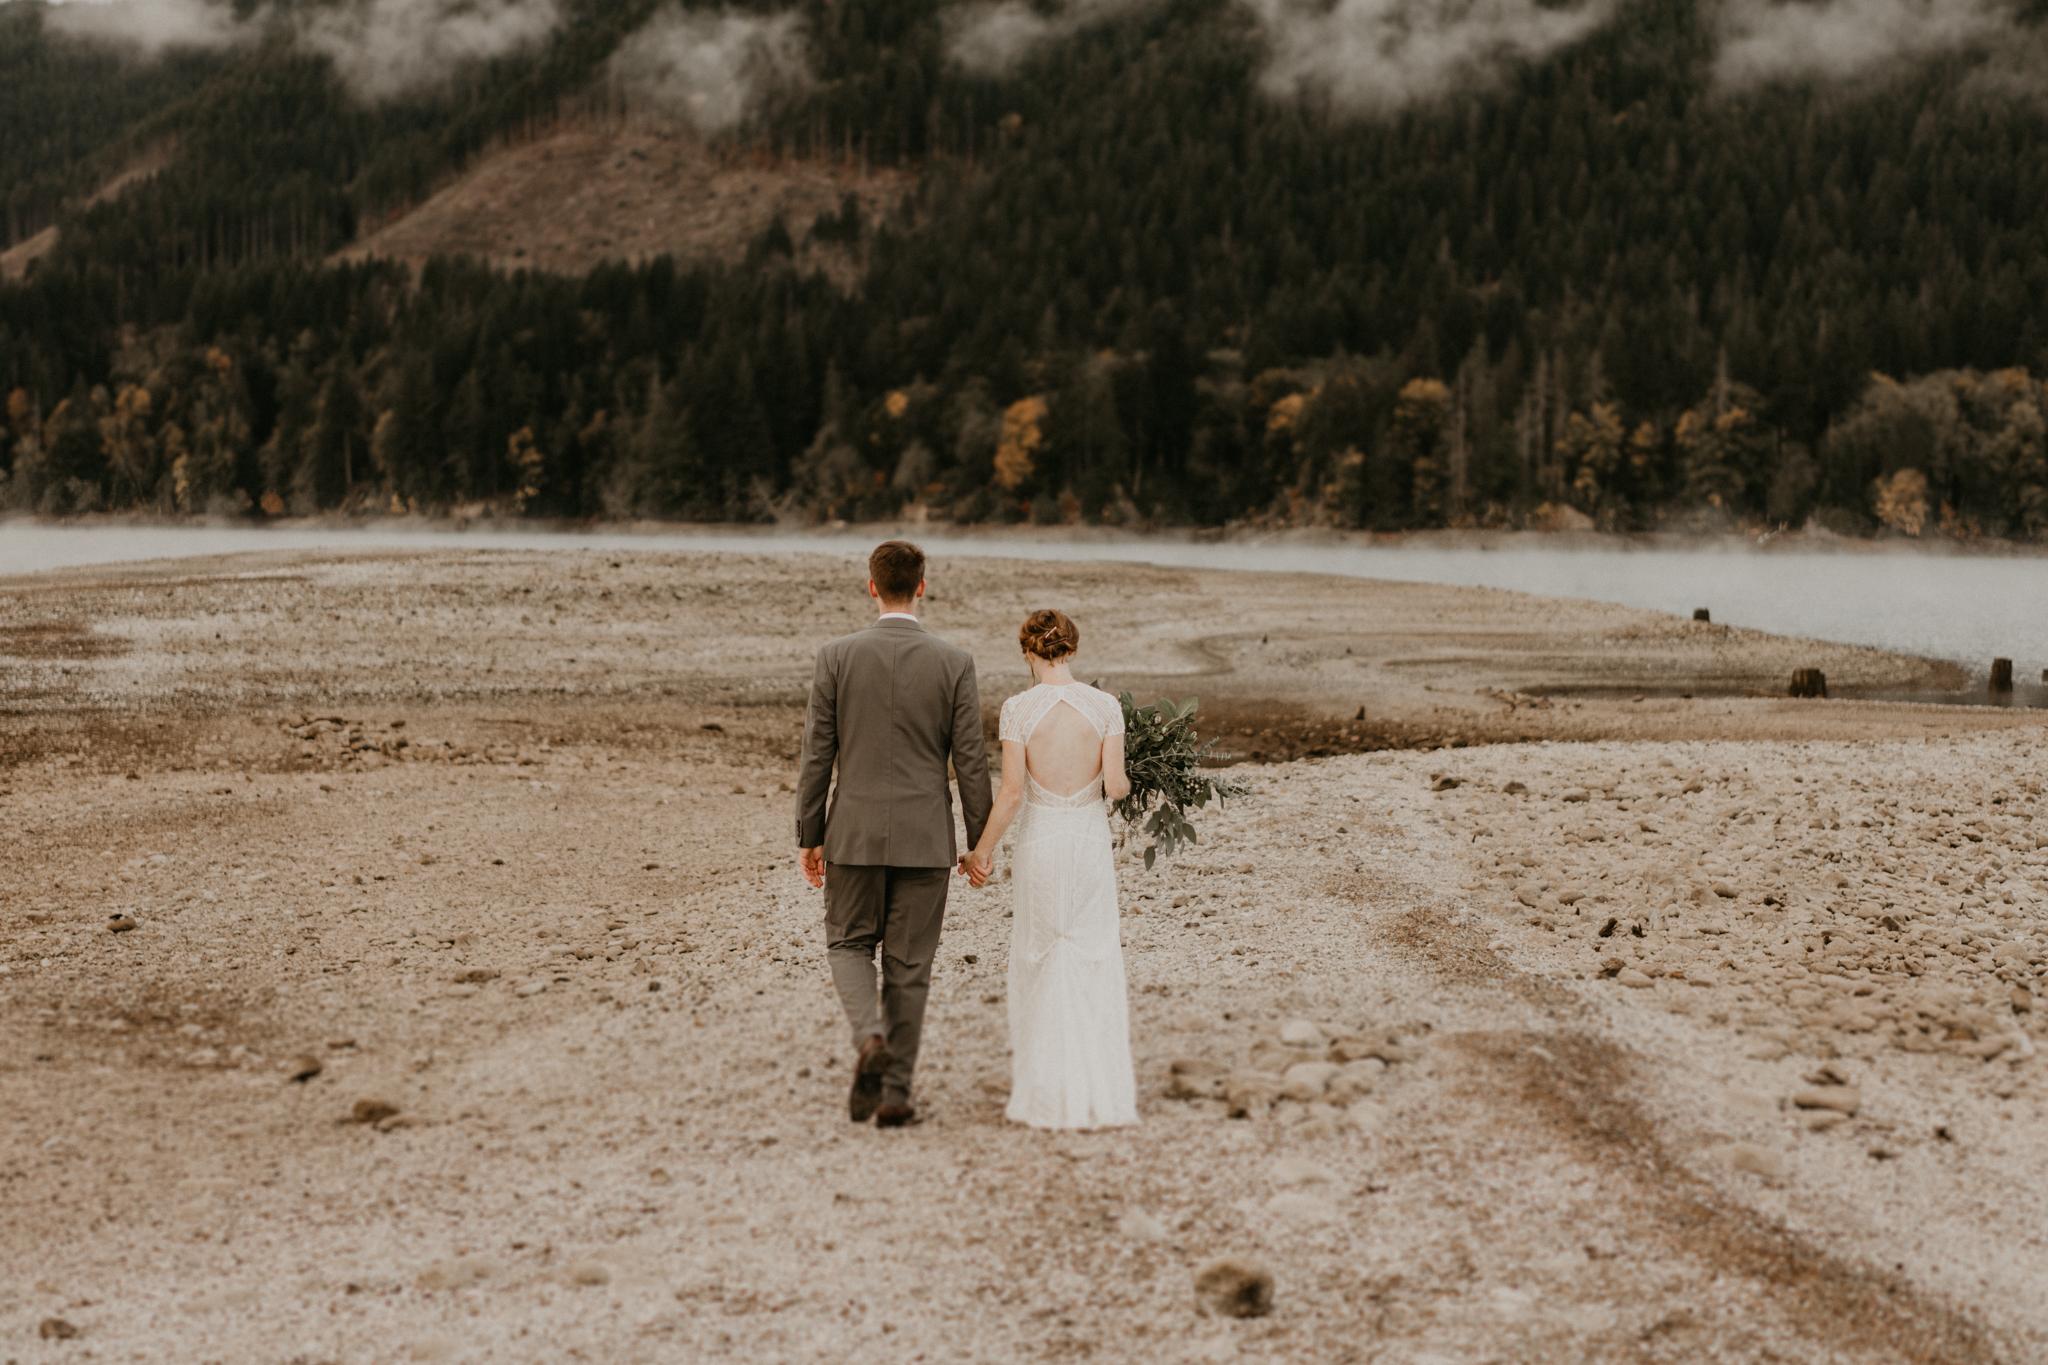 Lake-Cushman-Wedding-Elopement-Engagement-Seattle-Washington-PNW-Adventure-Nature-Photographer-7.jpg